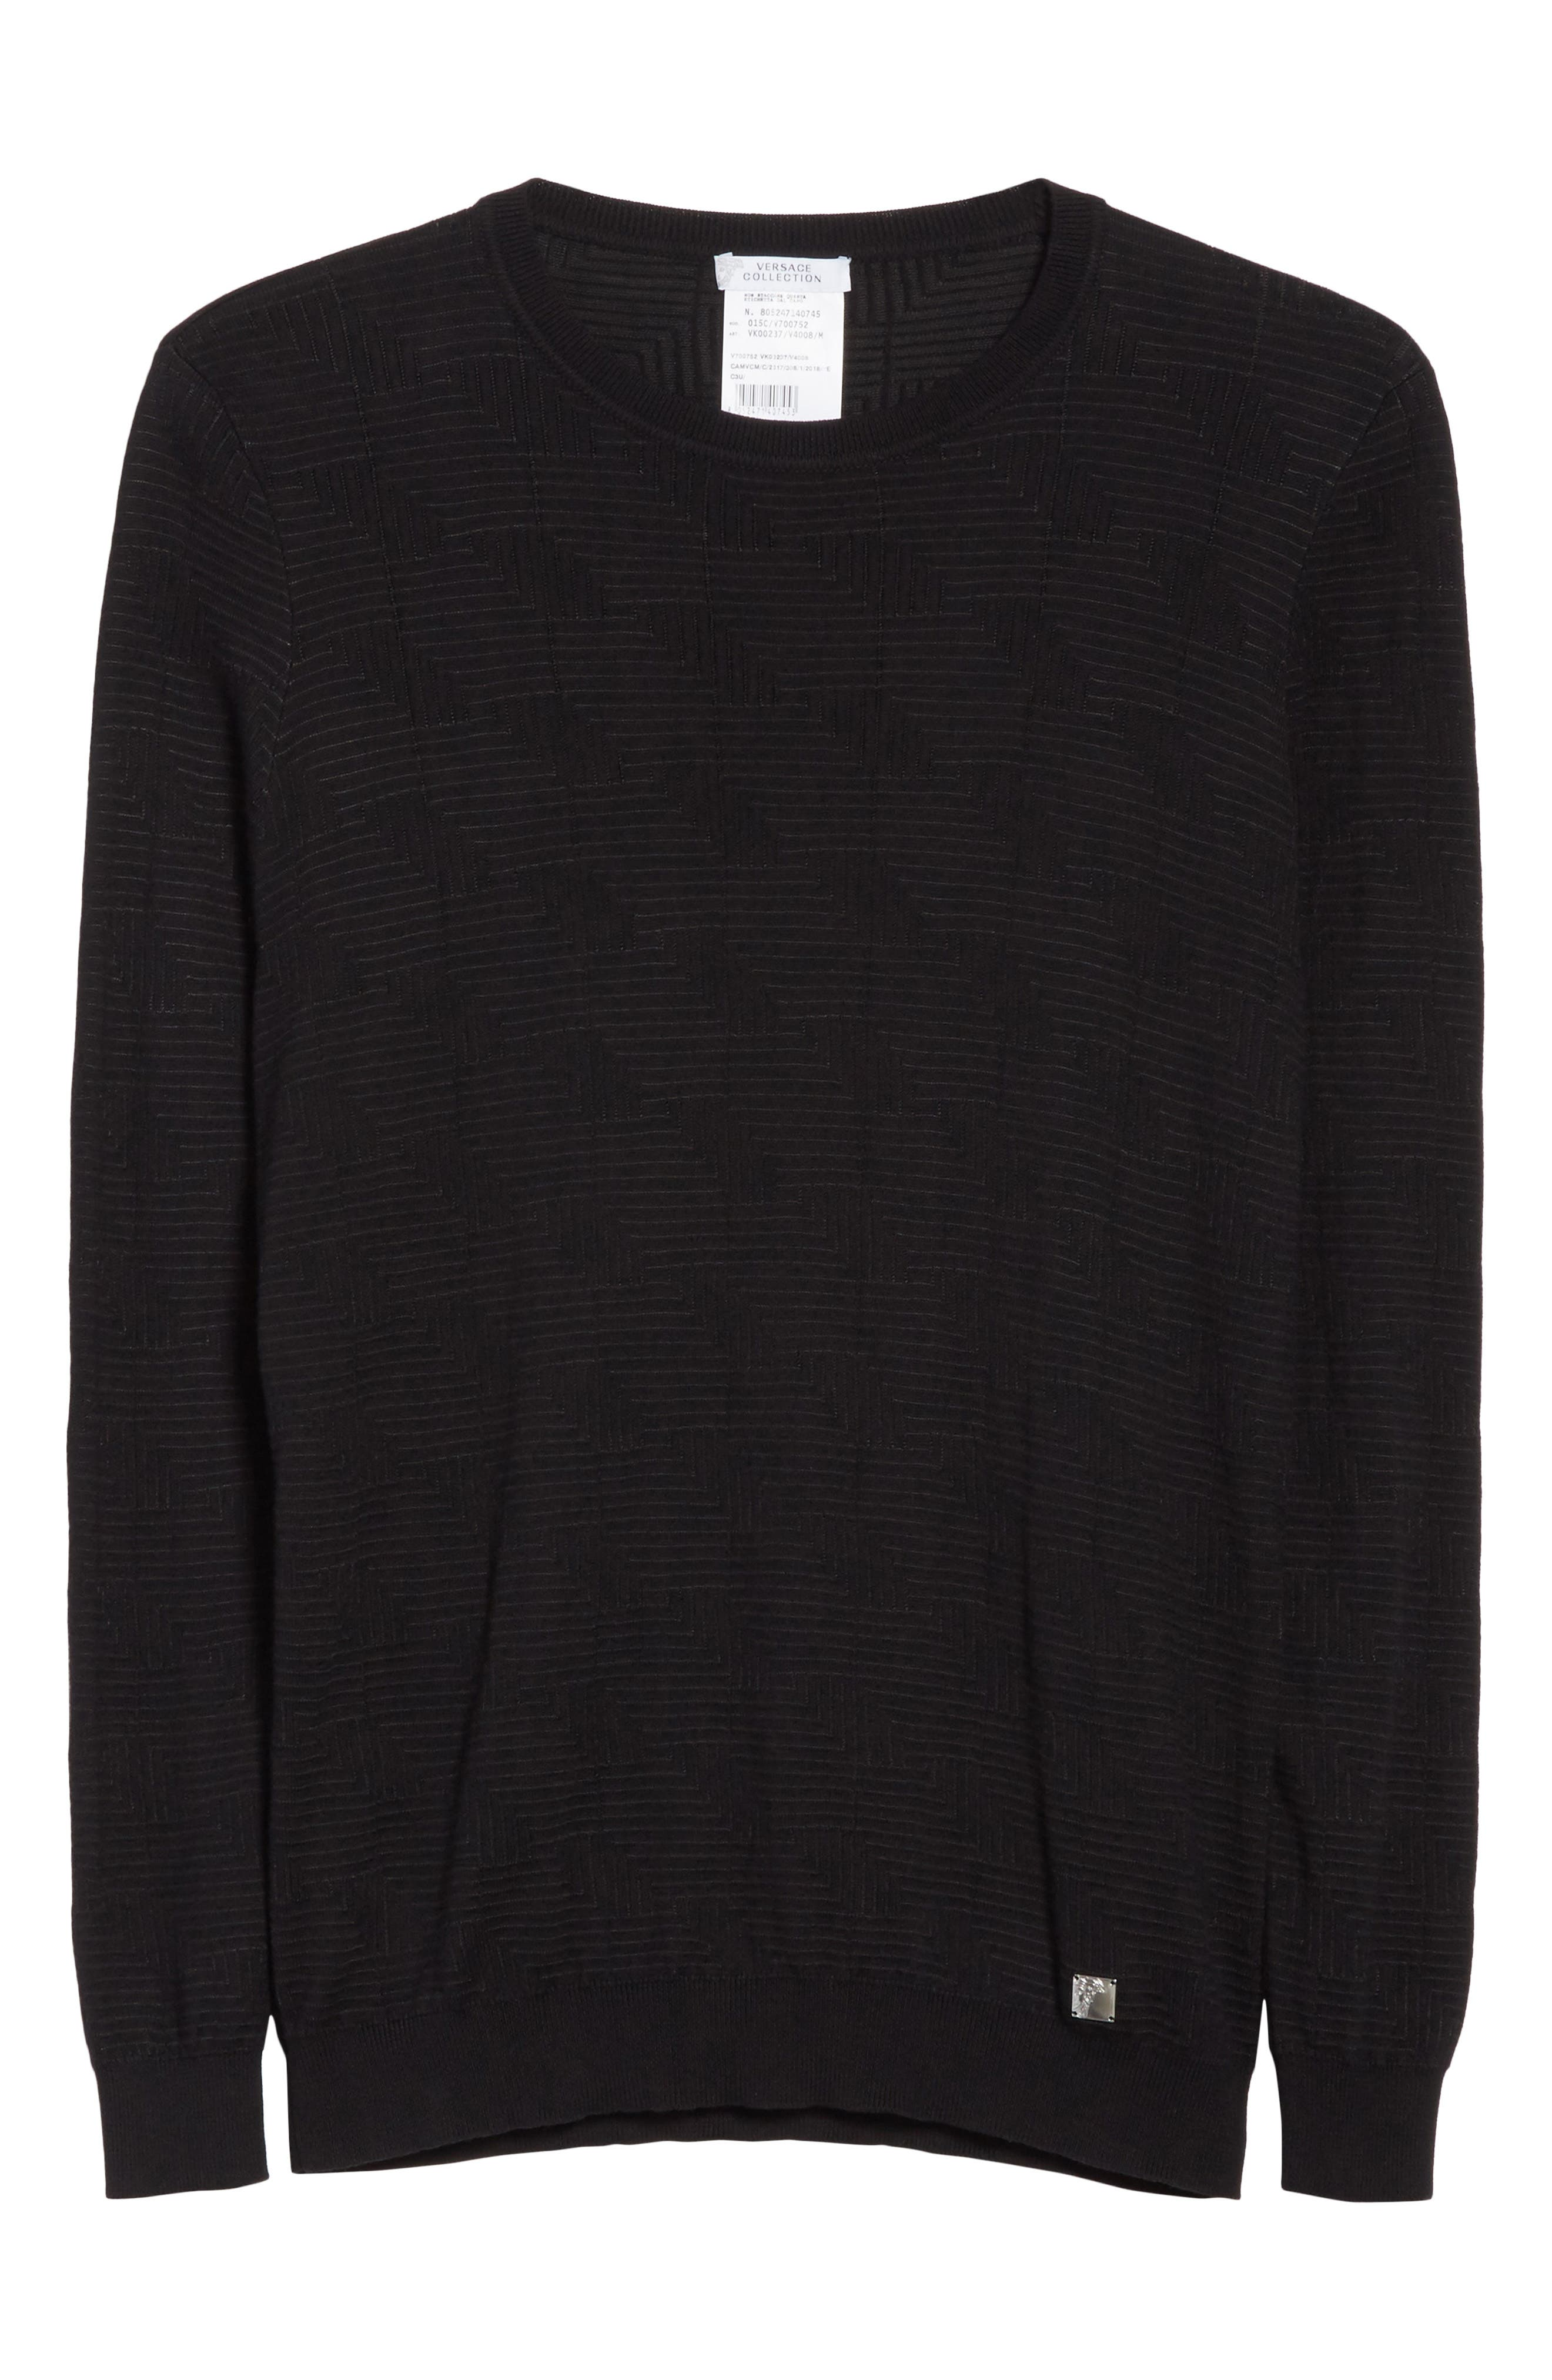 Frame Jacquard Sweater,                             Alternate thumbnail 6, color,                             001